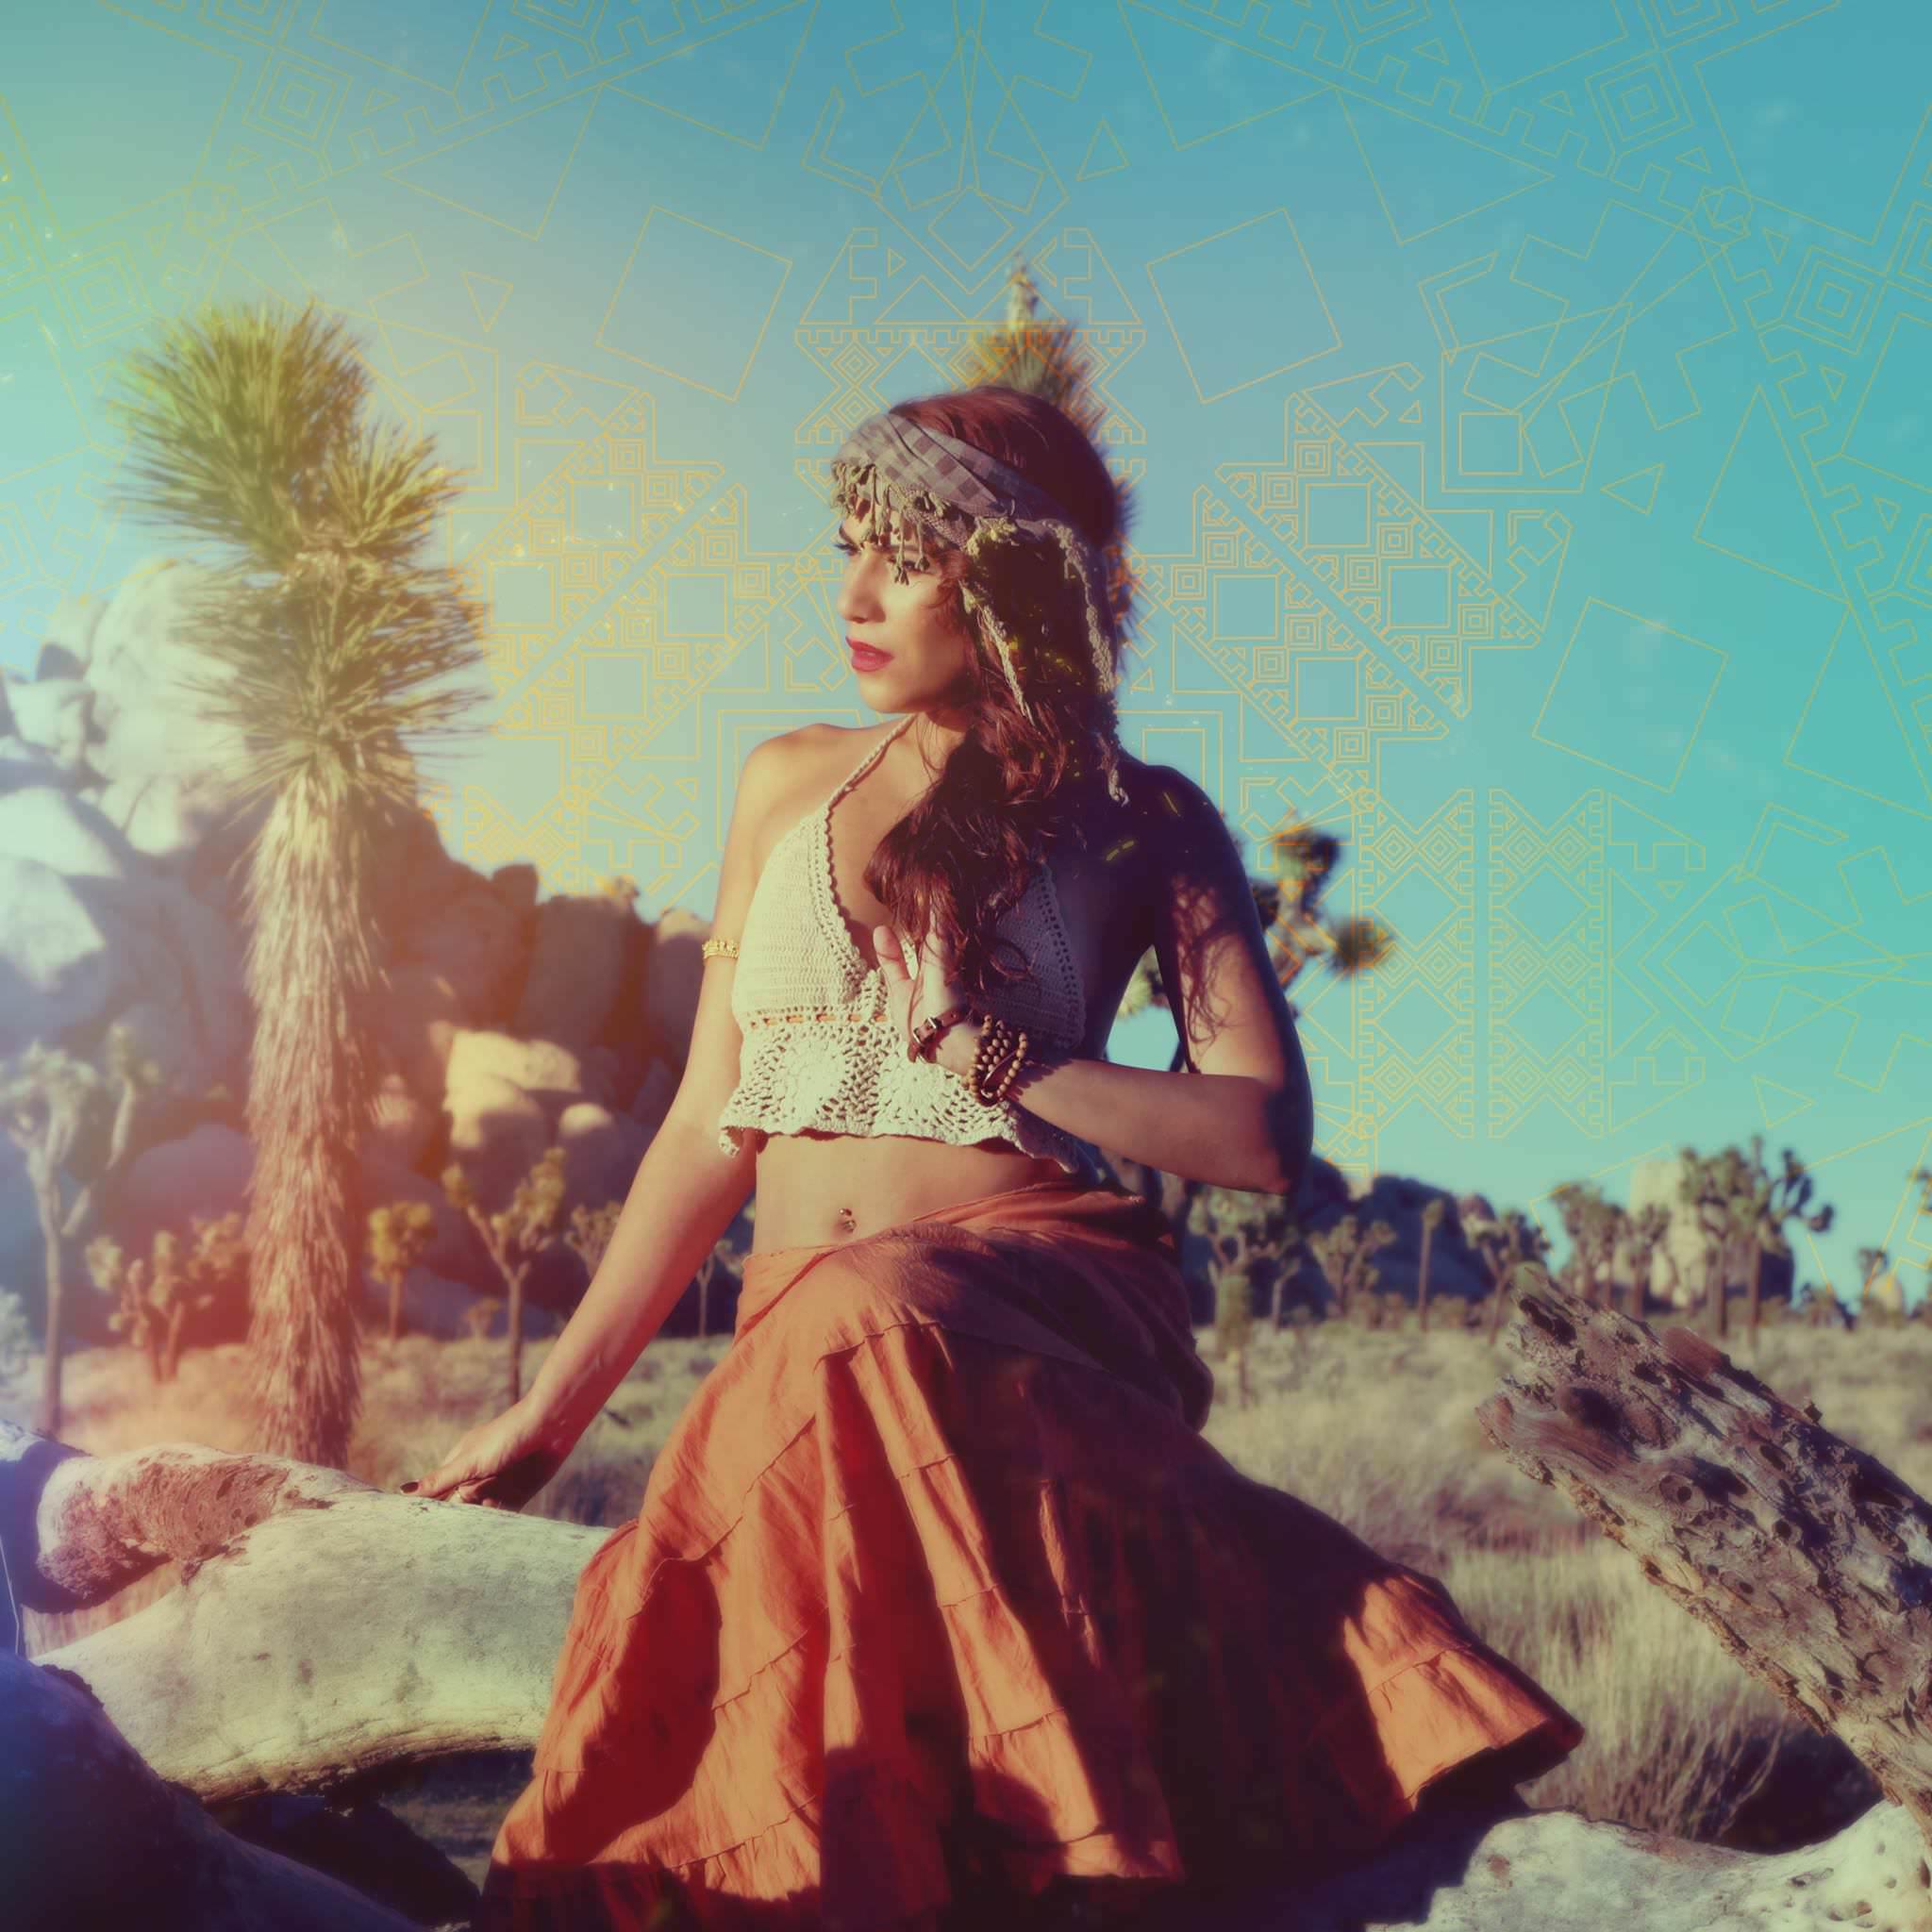 Summer Sol II: Helia Jamali's Visual Legacy of Sound